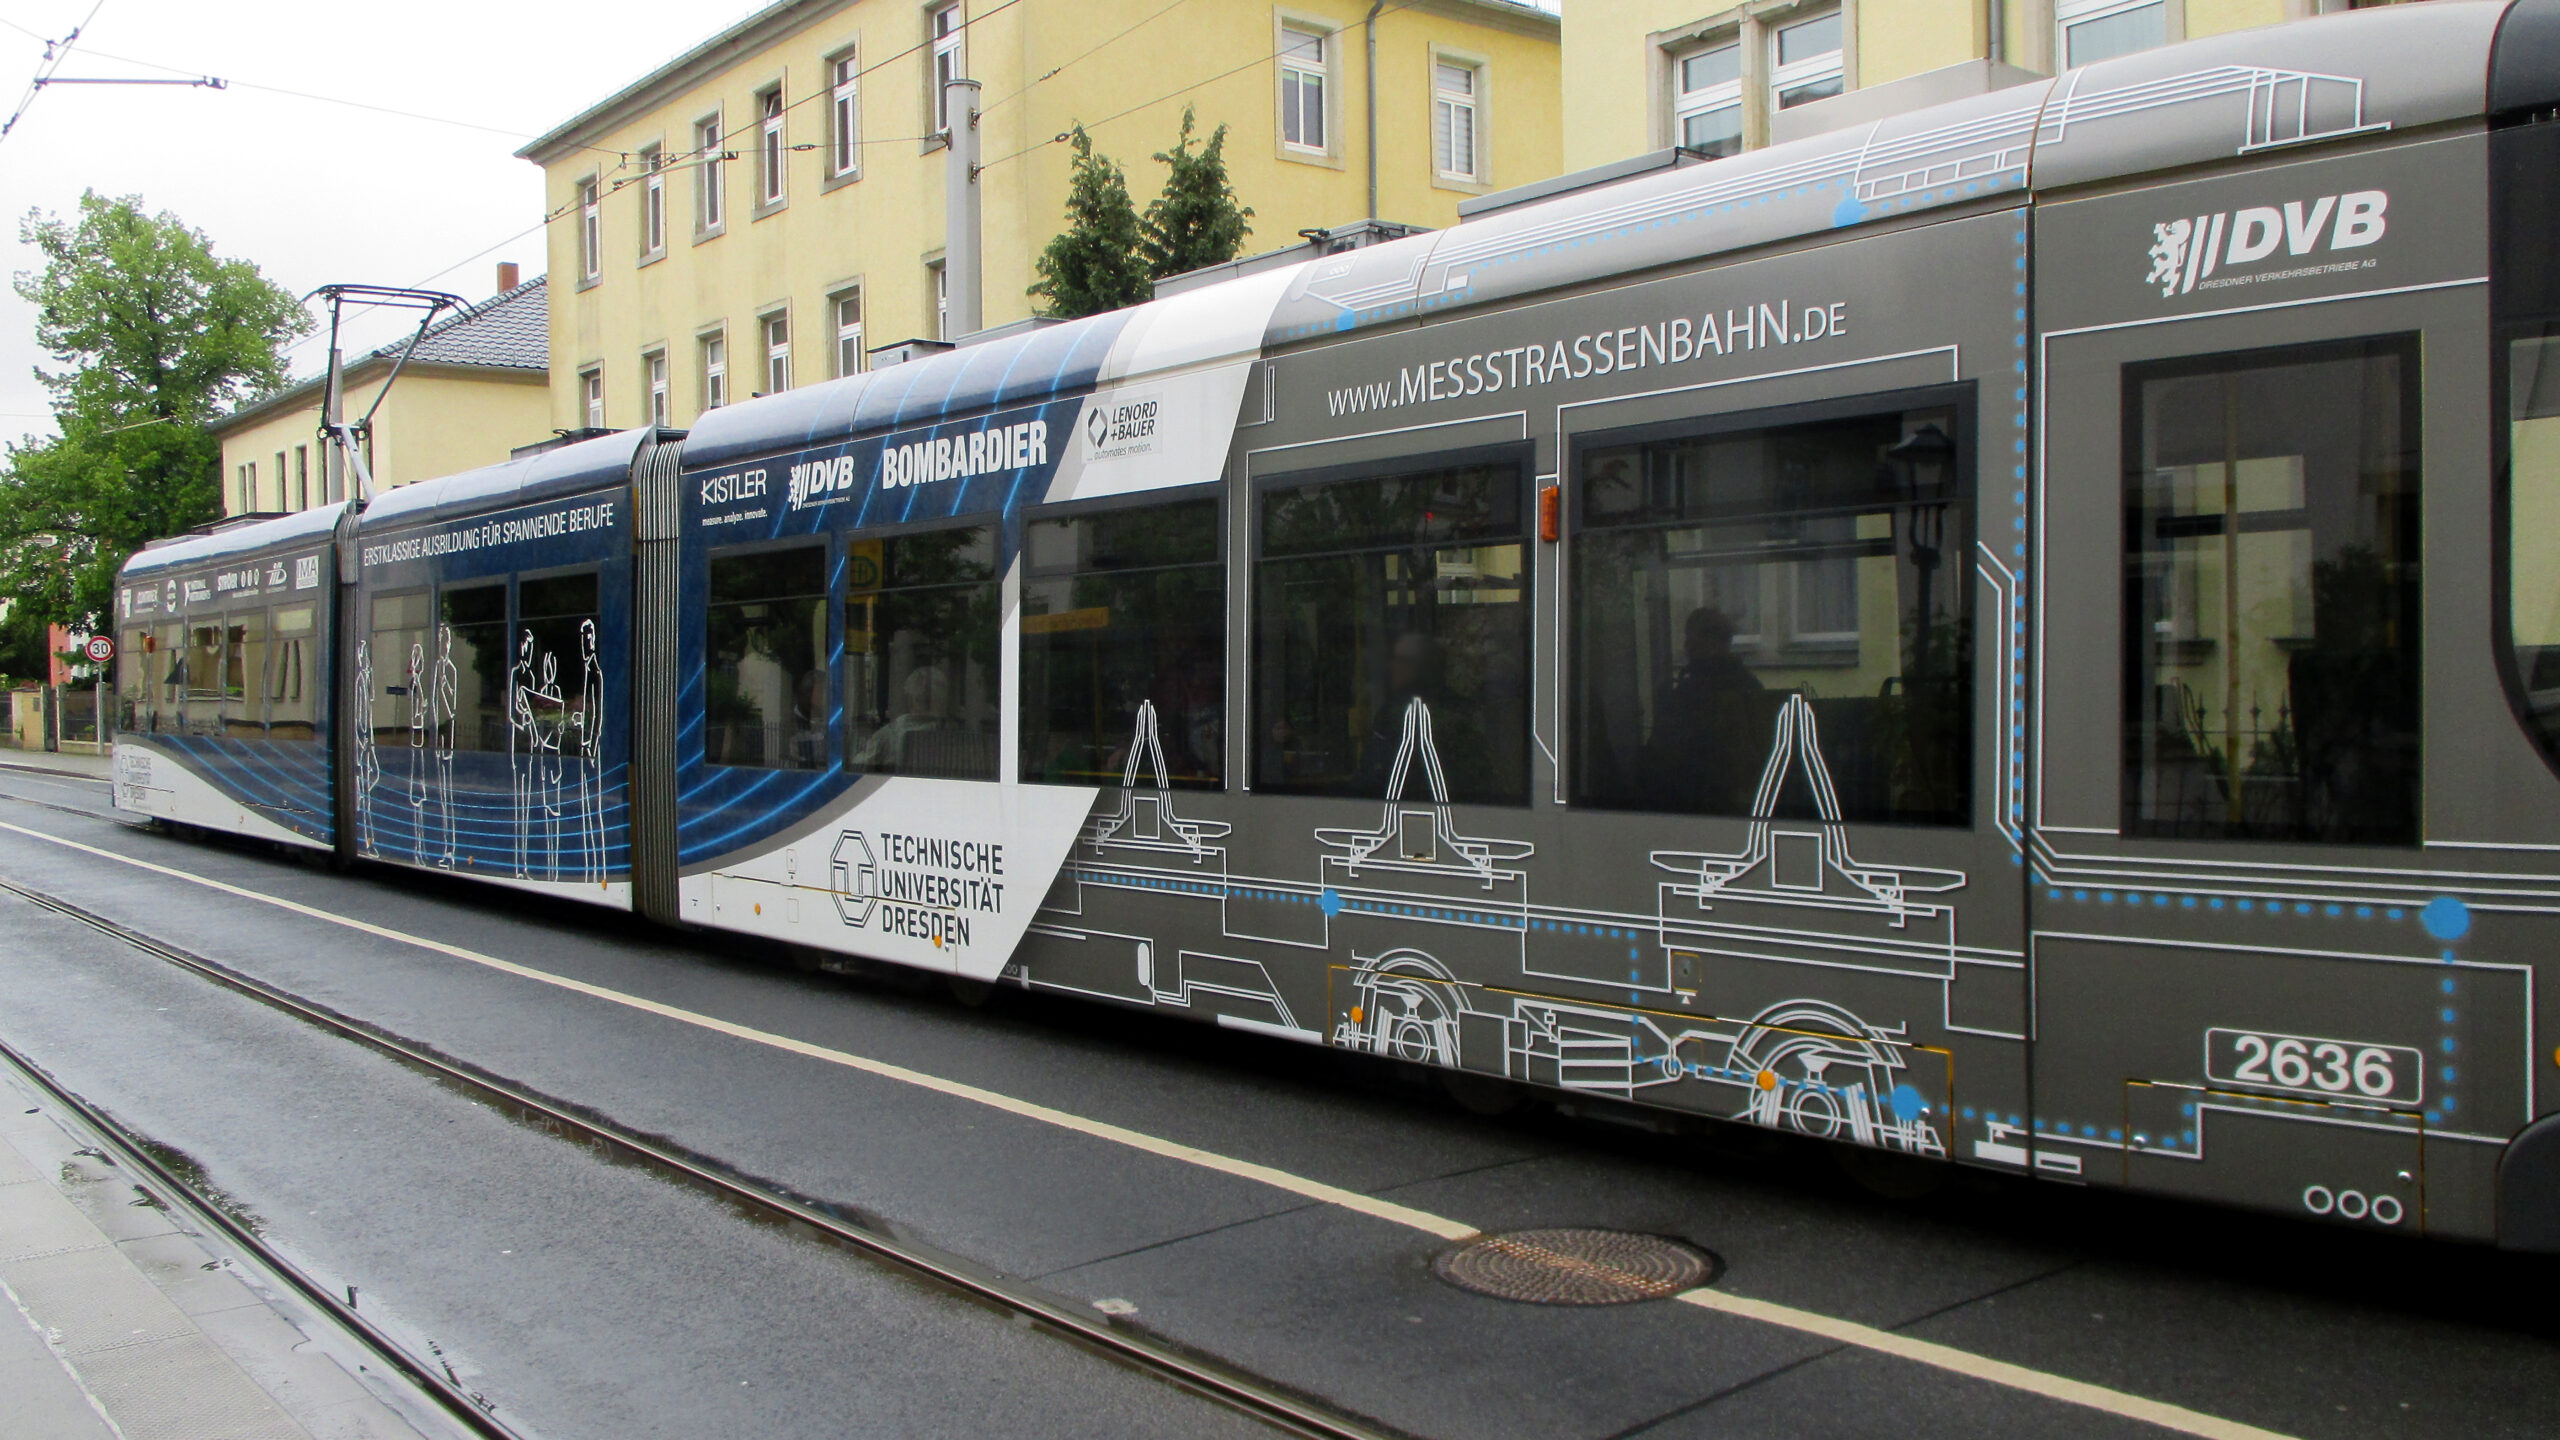 Dresden tram in TU Dresden livery